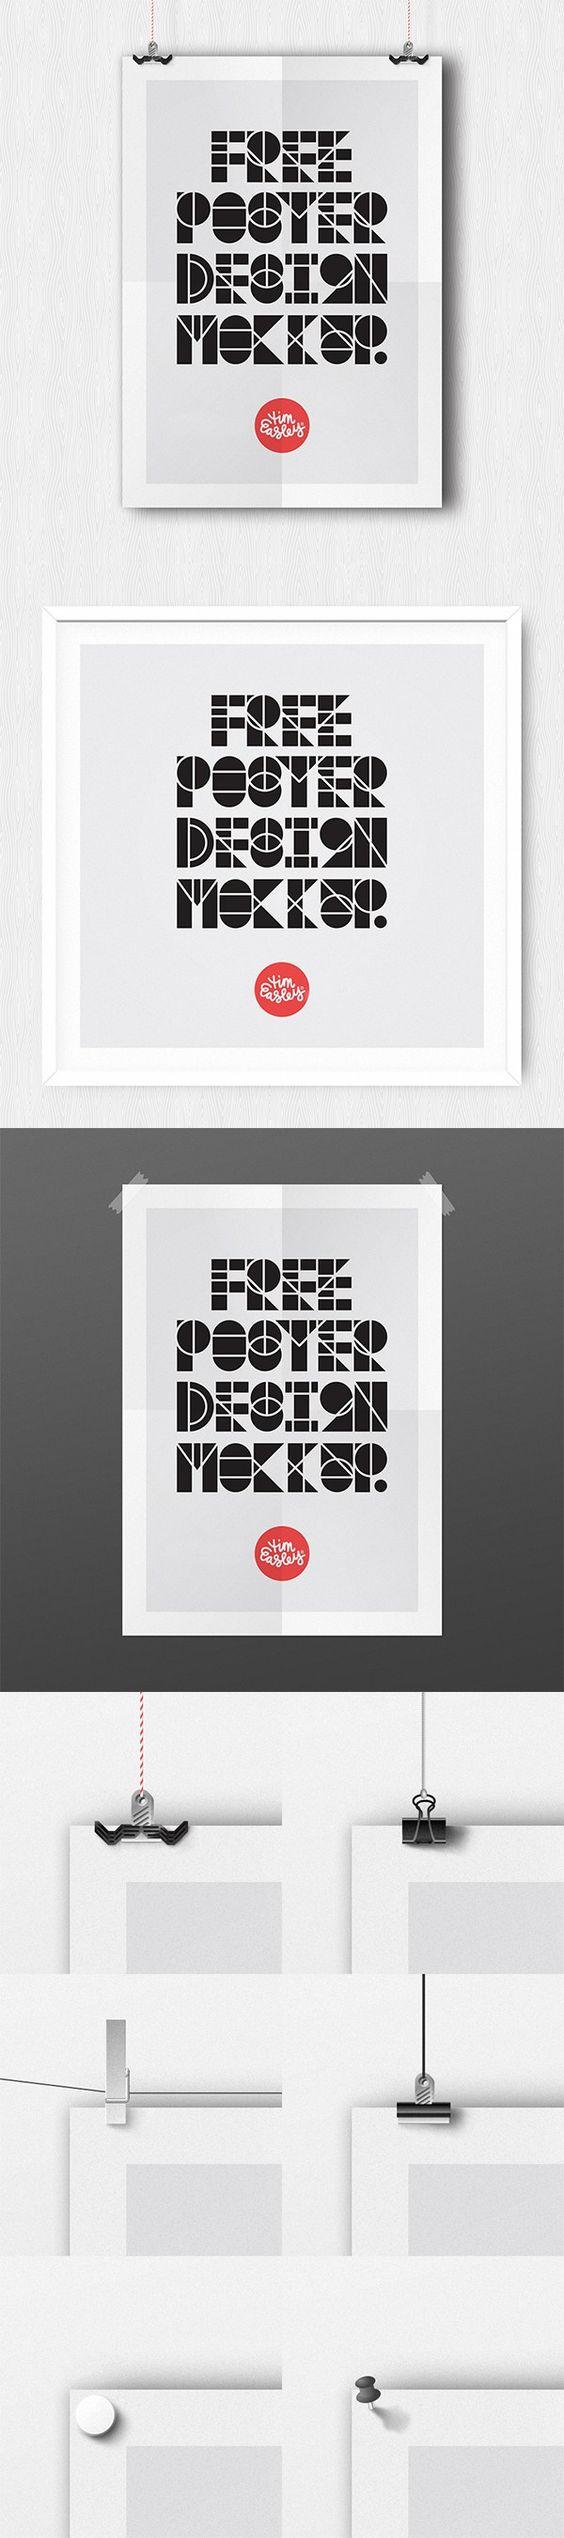 Poster design mockup - Free Poster Design Mockup